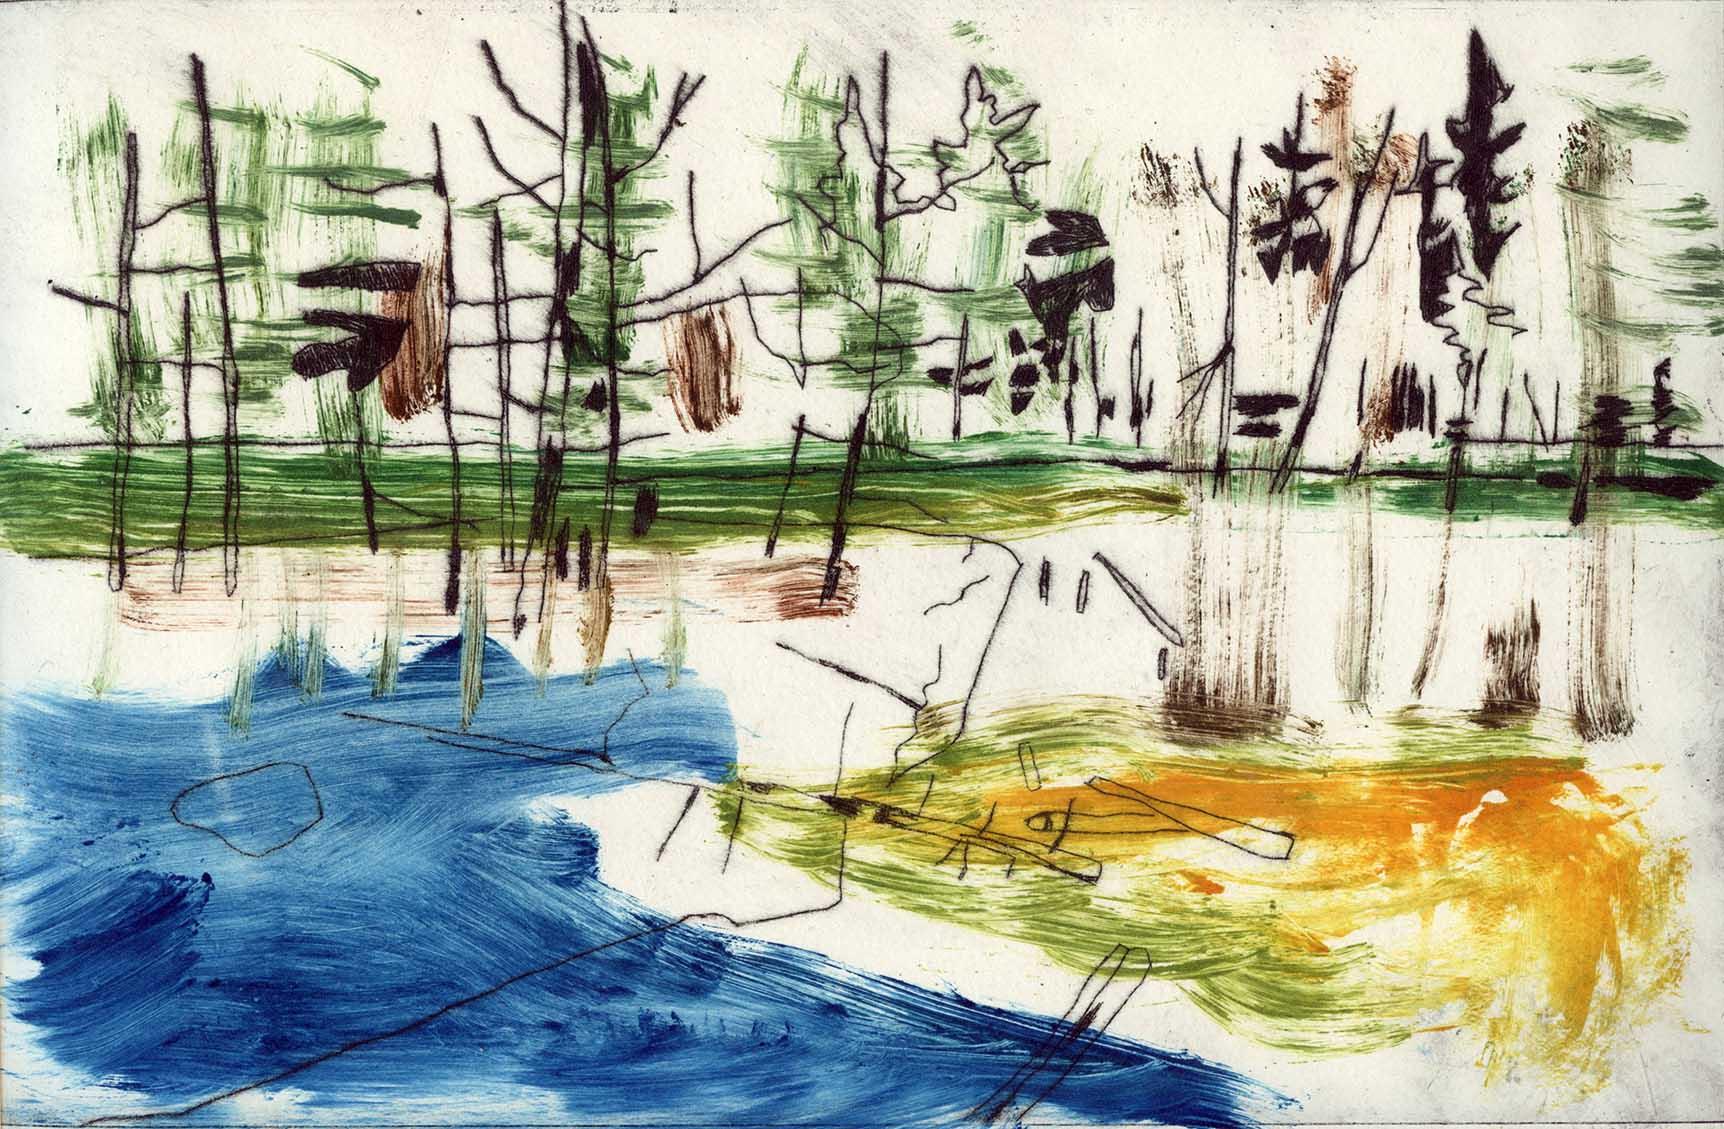 Kate Evans Lake Study I, Algonquin, 33x44cm, Kate Evans